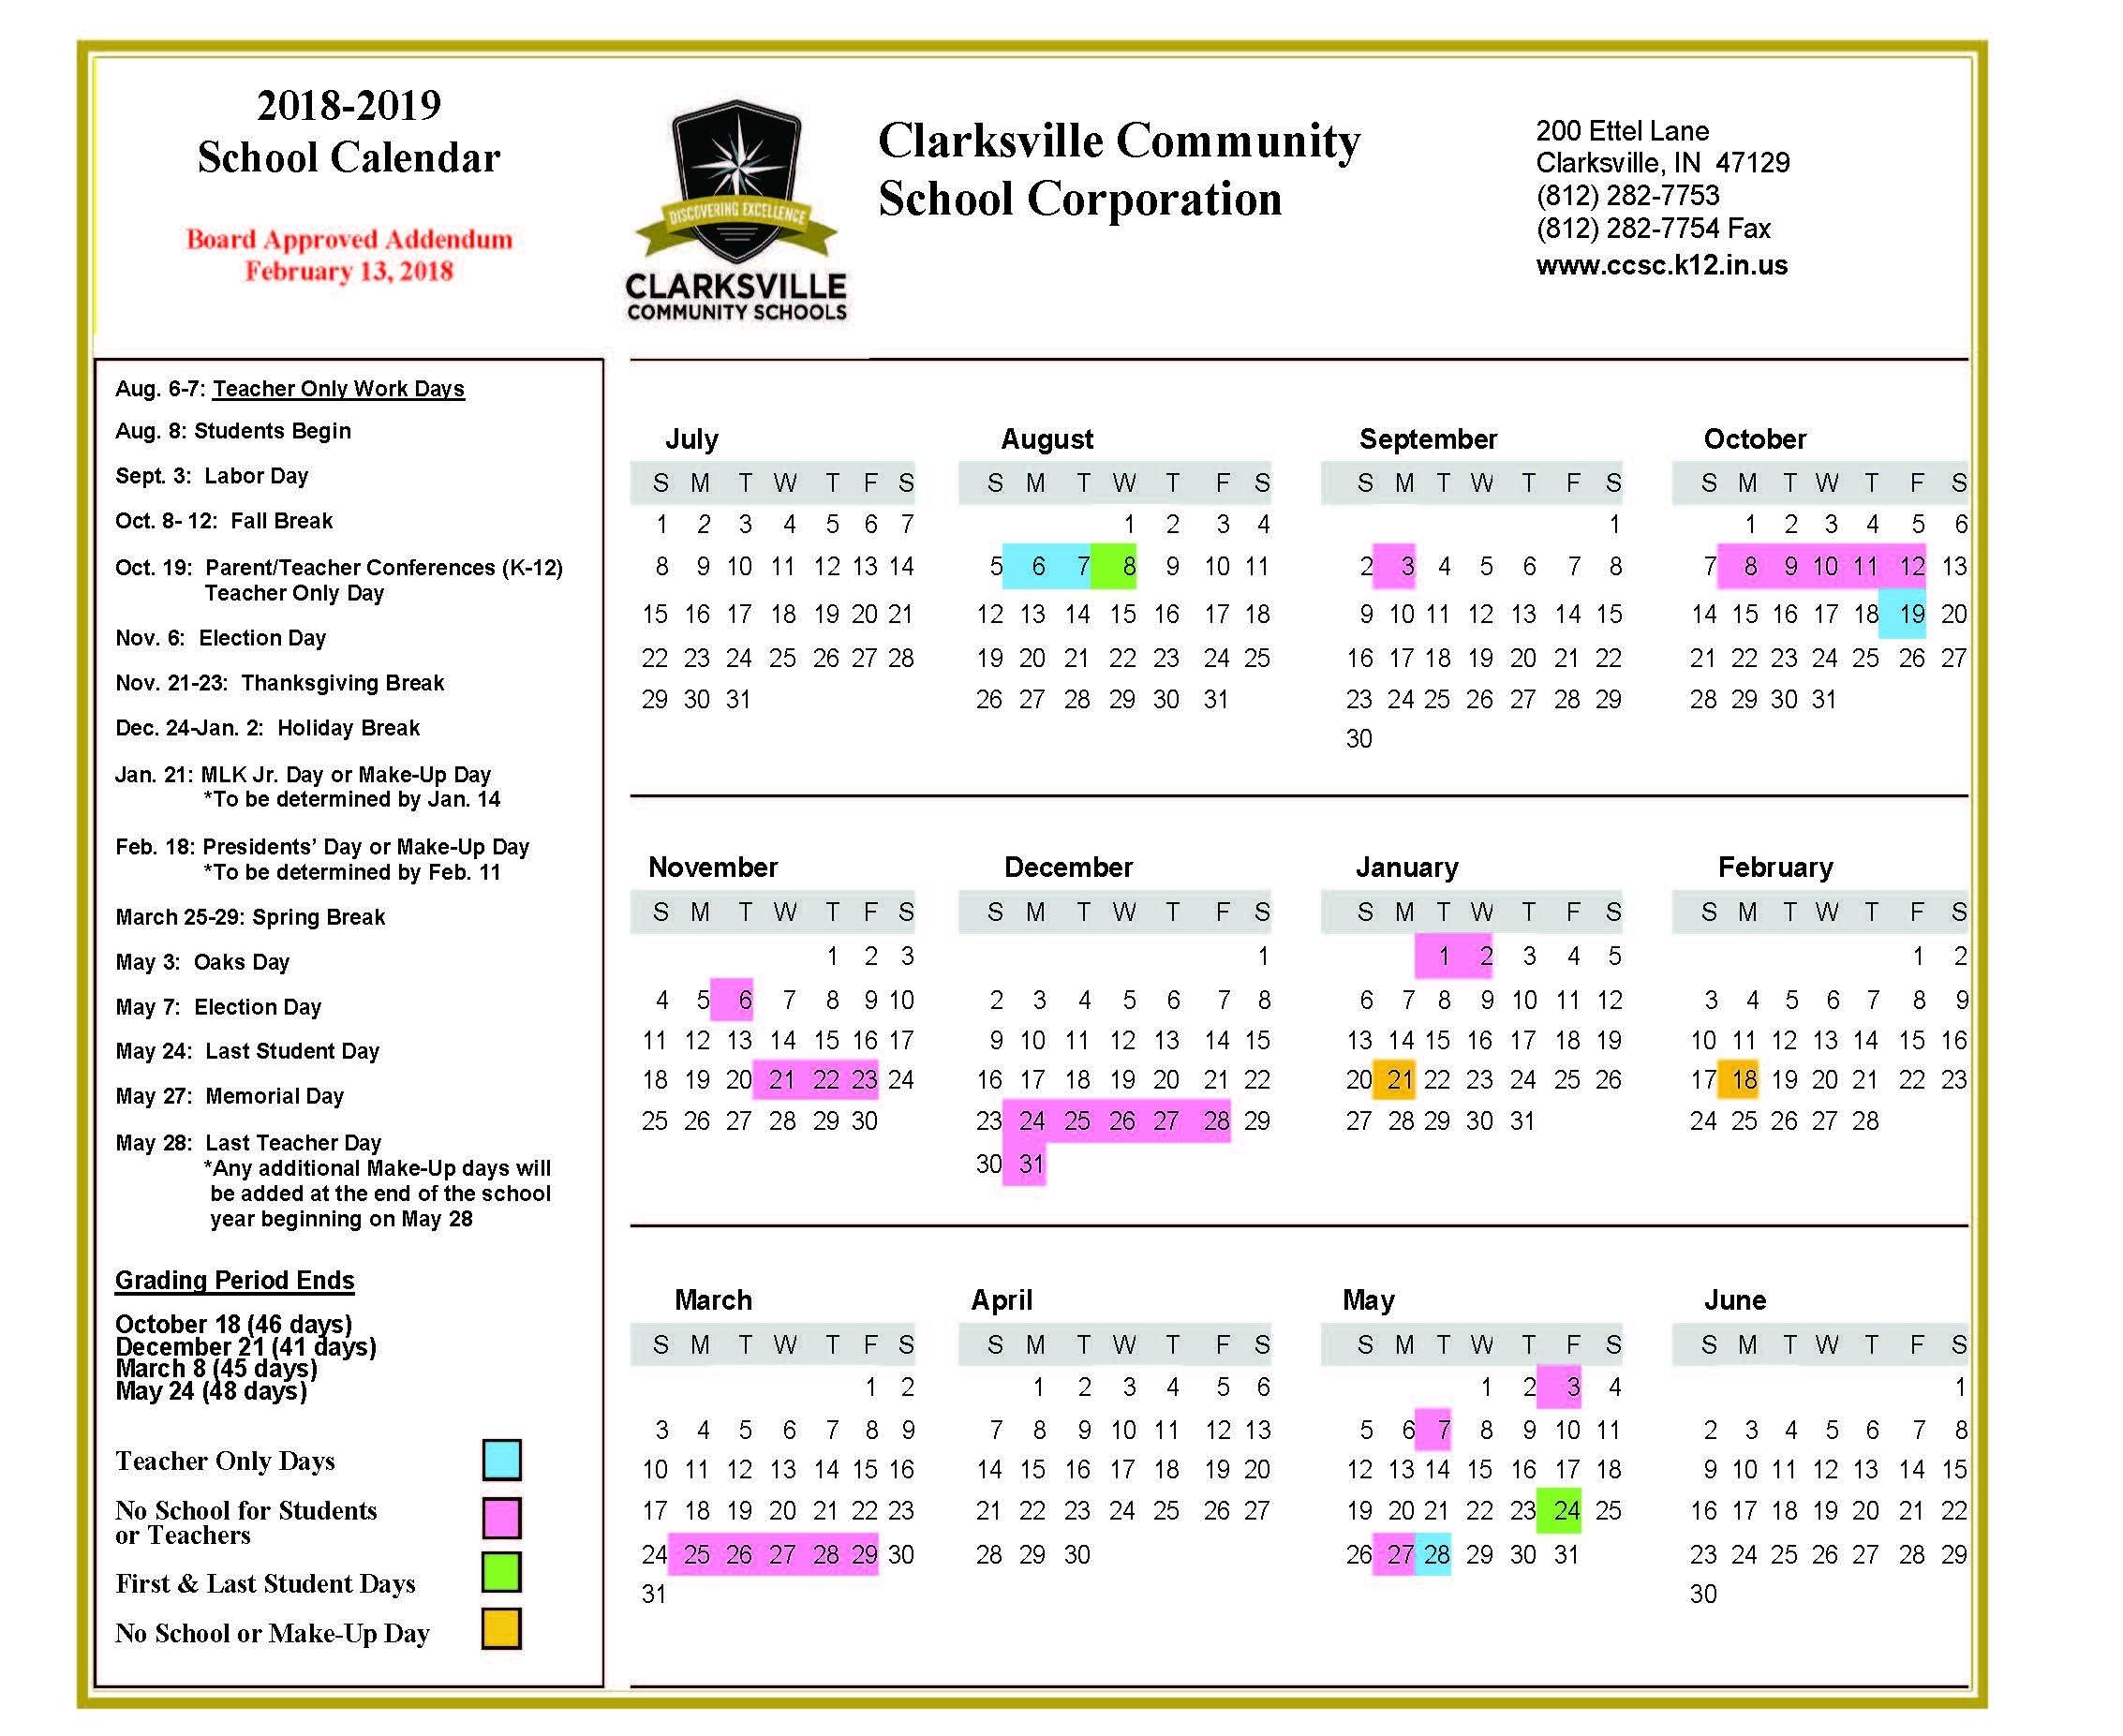 2018 19 Ccsc School Calendar Approved | Clarksville Community School Indiana U Calendar 2019